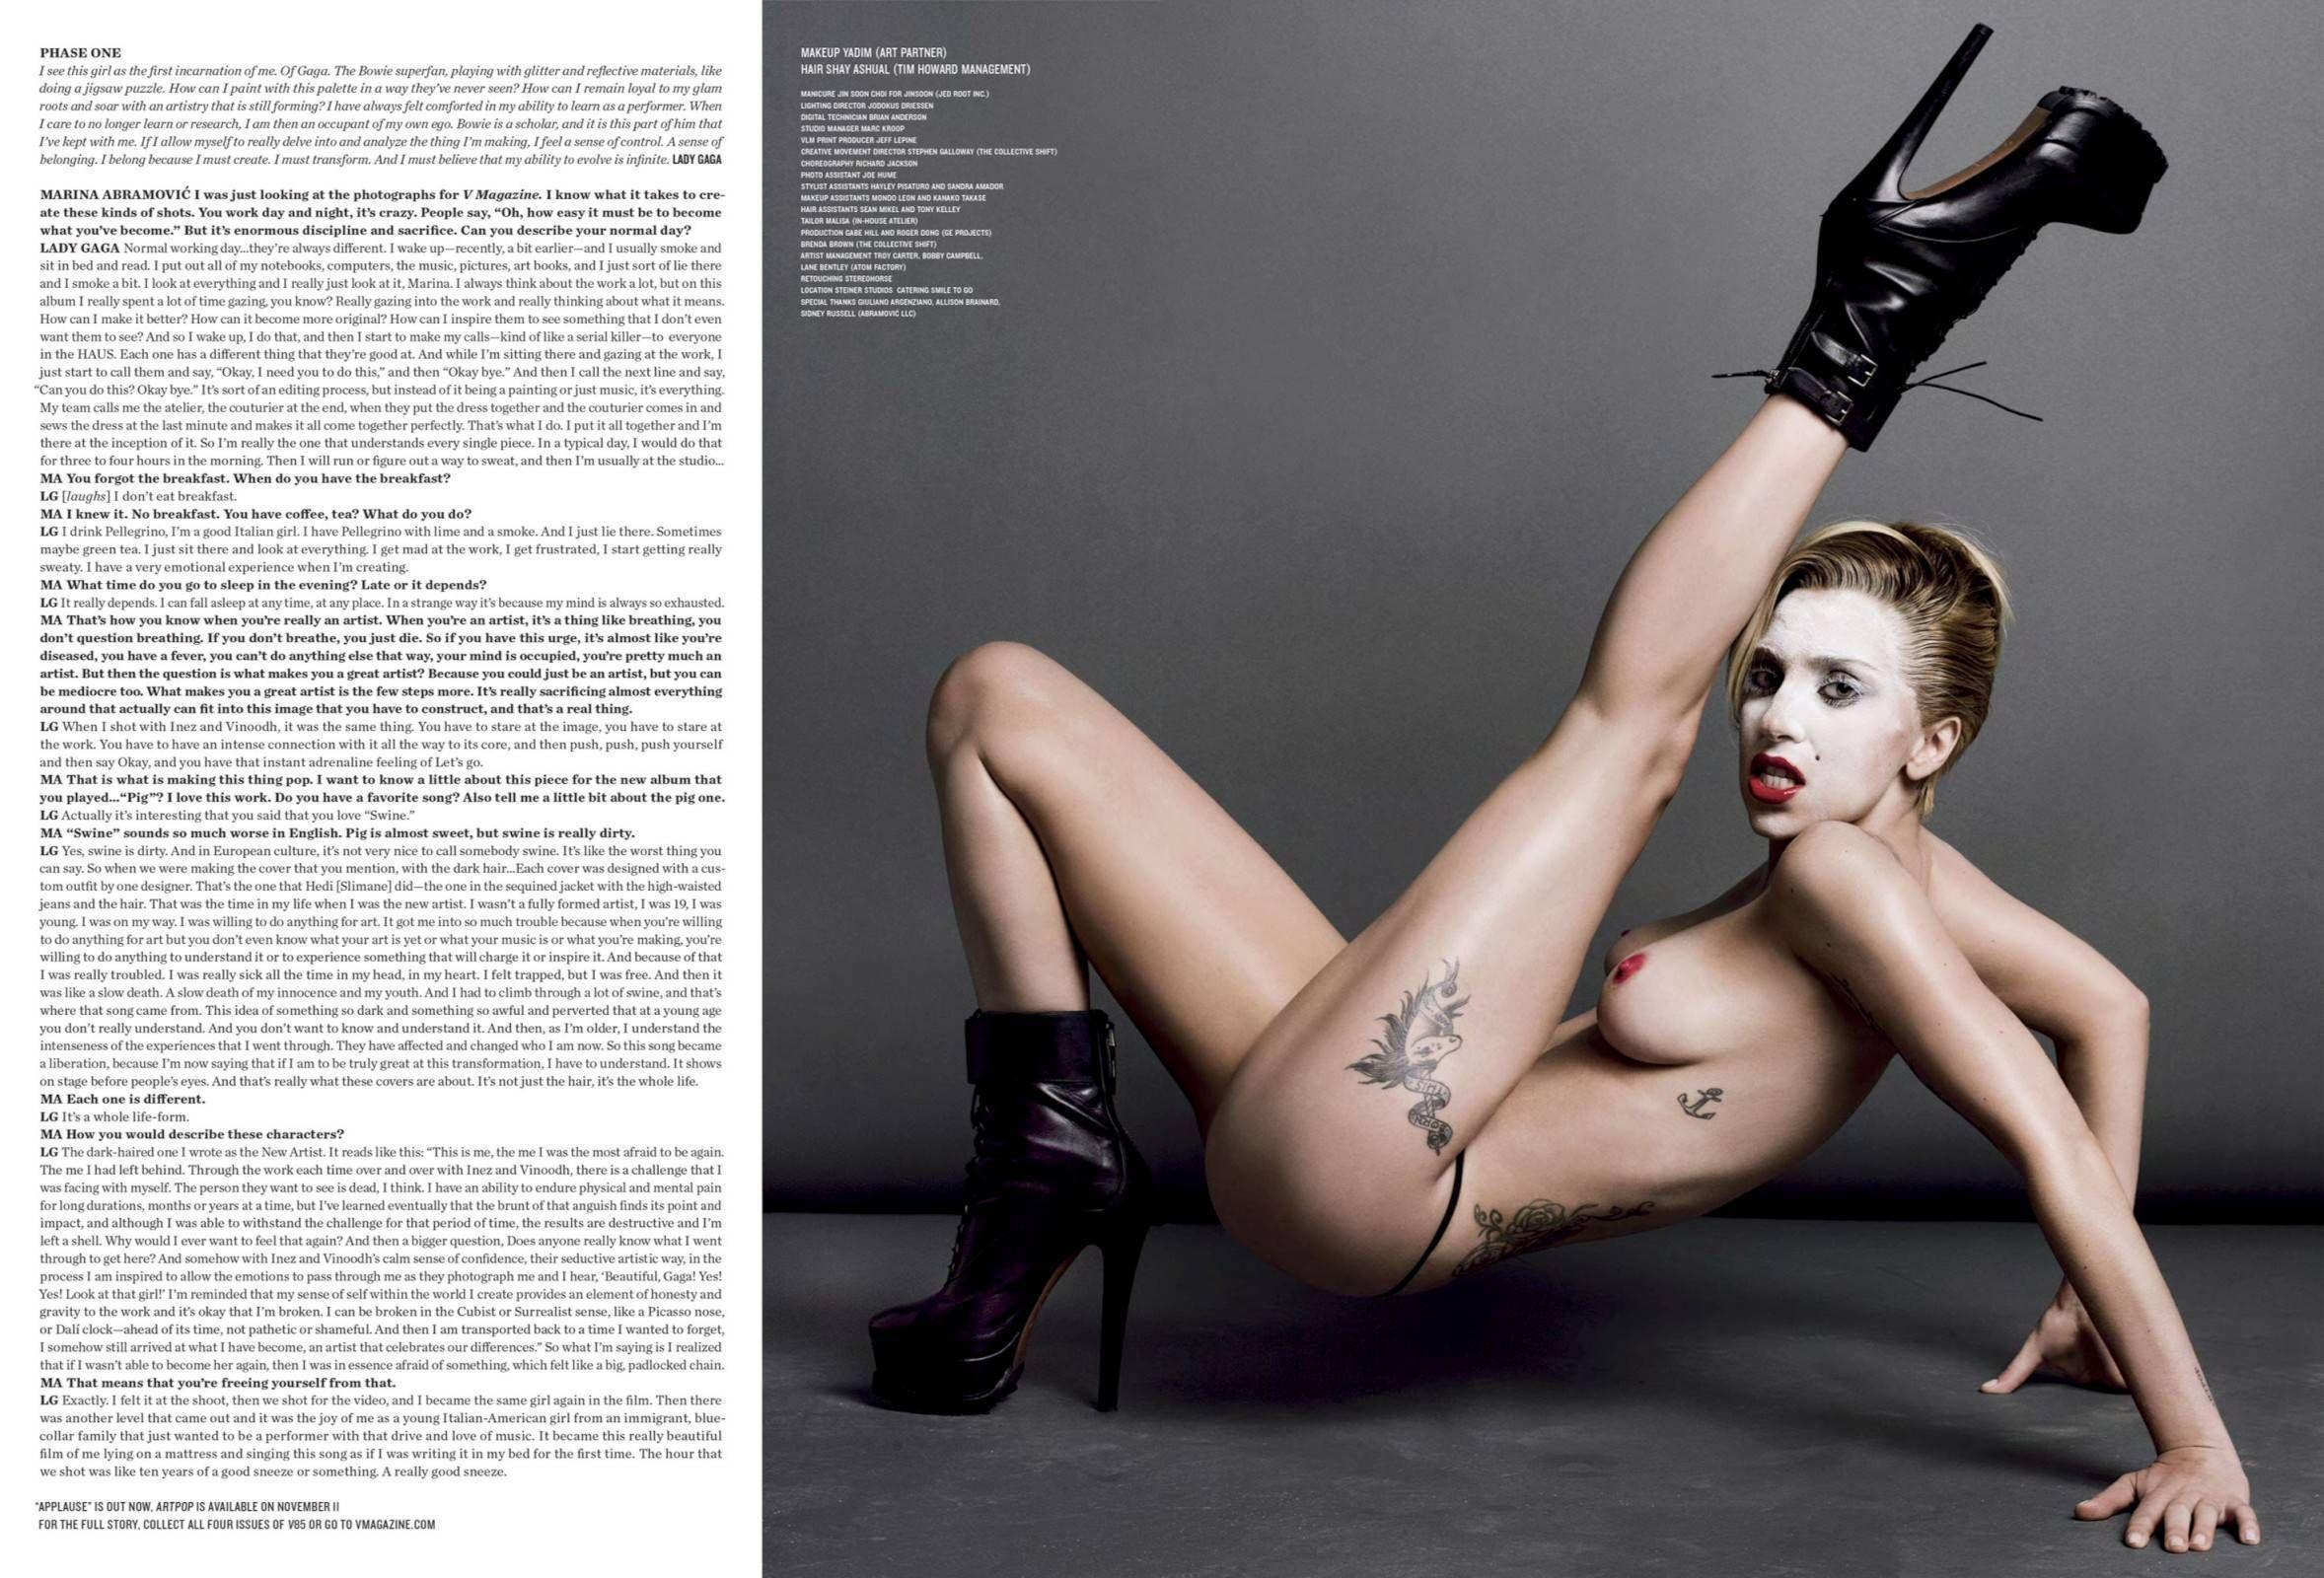 Nude Photograph Of Lady Gaga Leaks